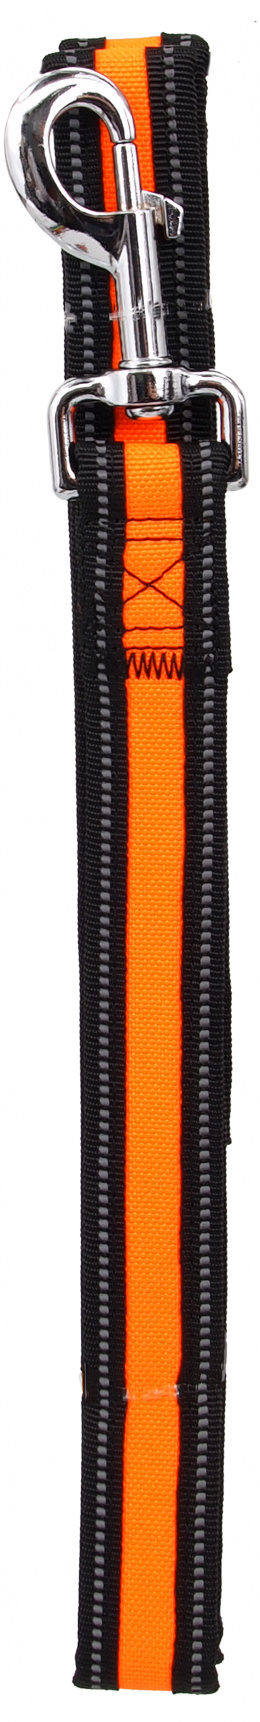 Vodítko Dog Fantasy Neoprene M/L oranžové 2,5x120cm